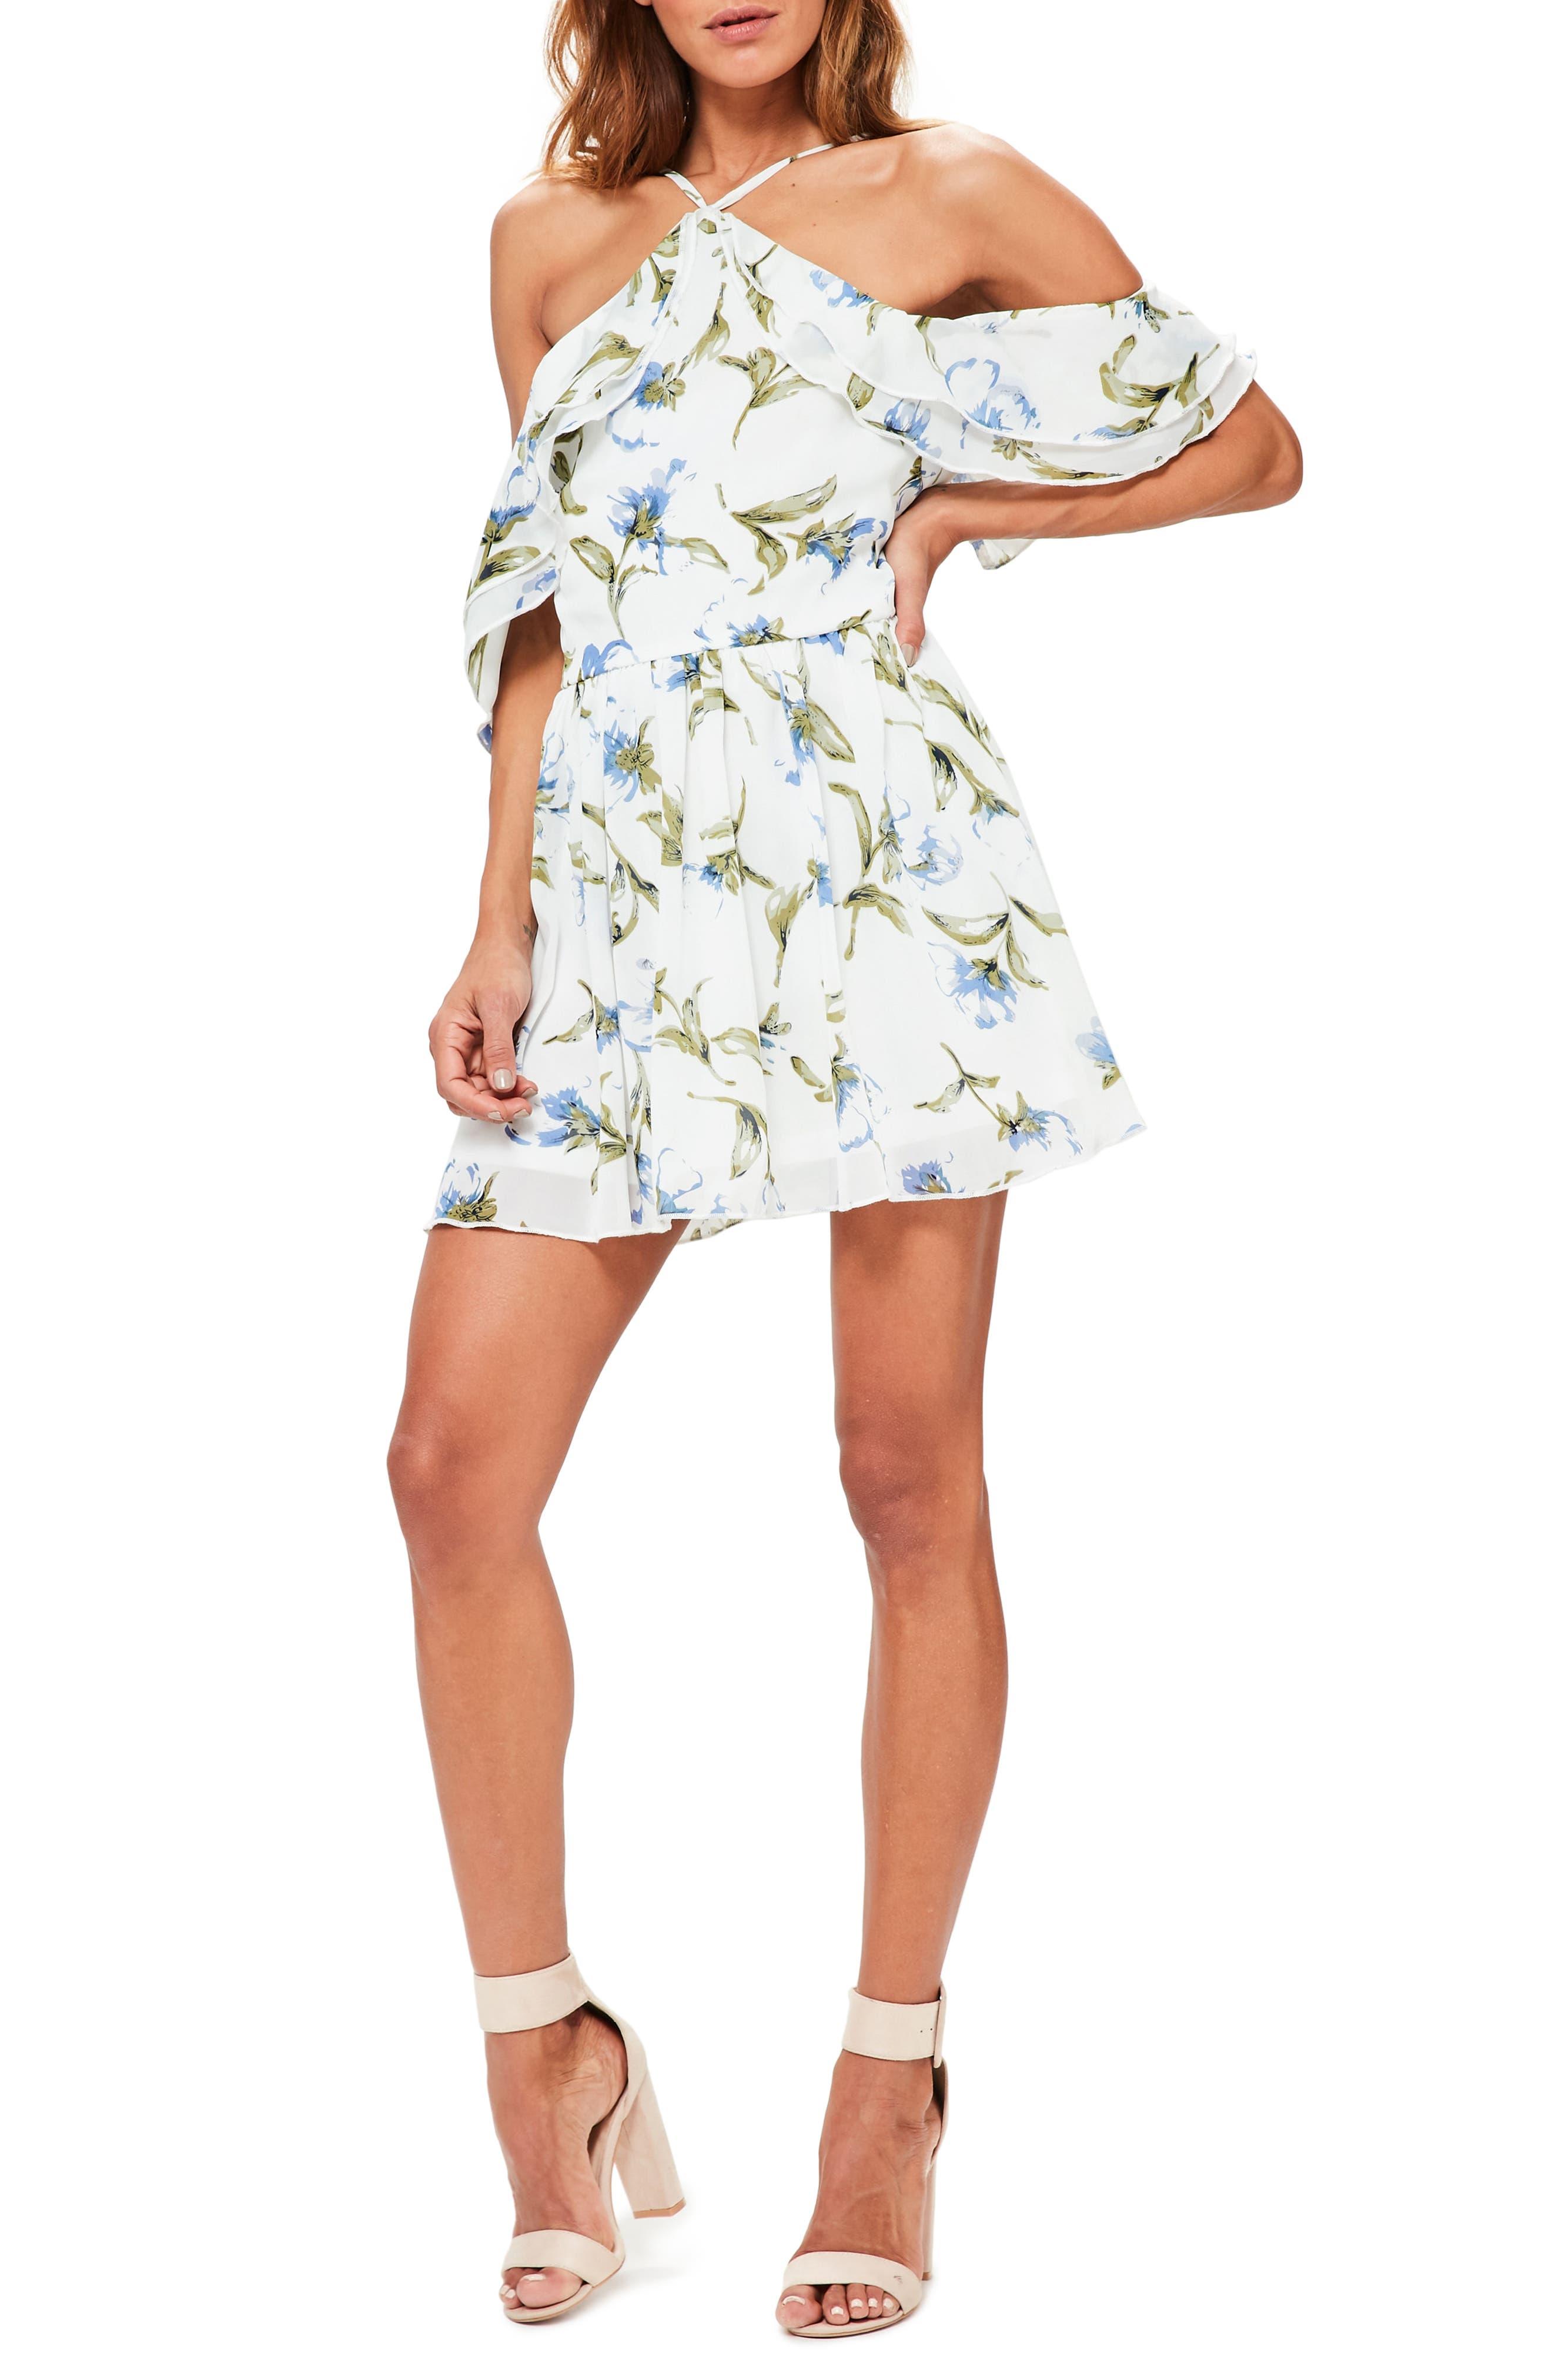 Alternate Image 1 Selected - Missguided Floral Off the Shoulder Minidress